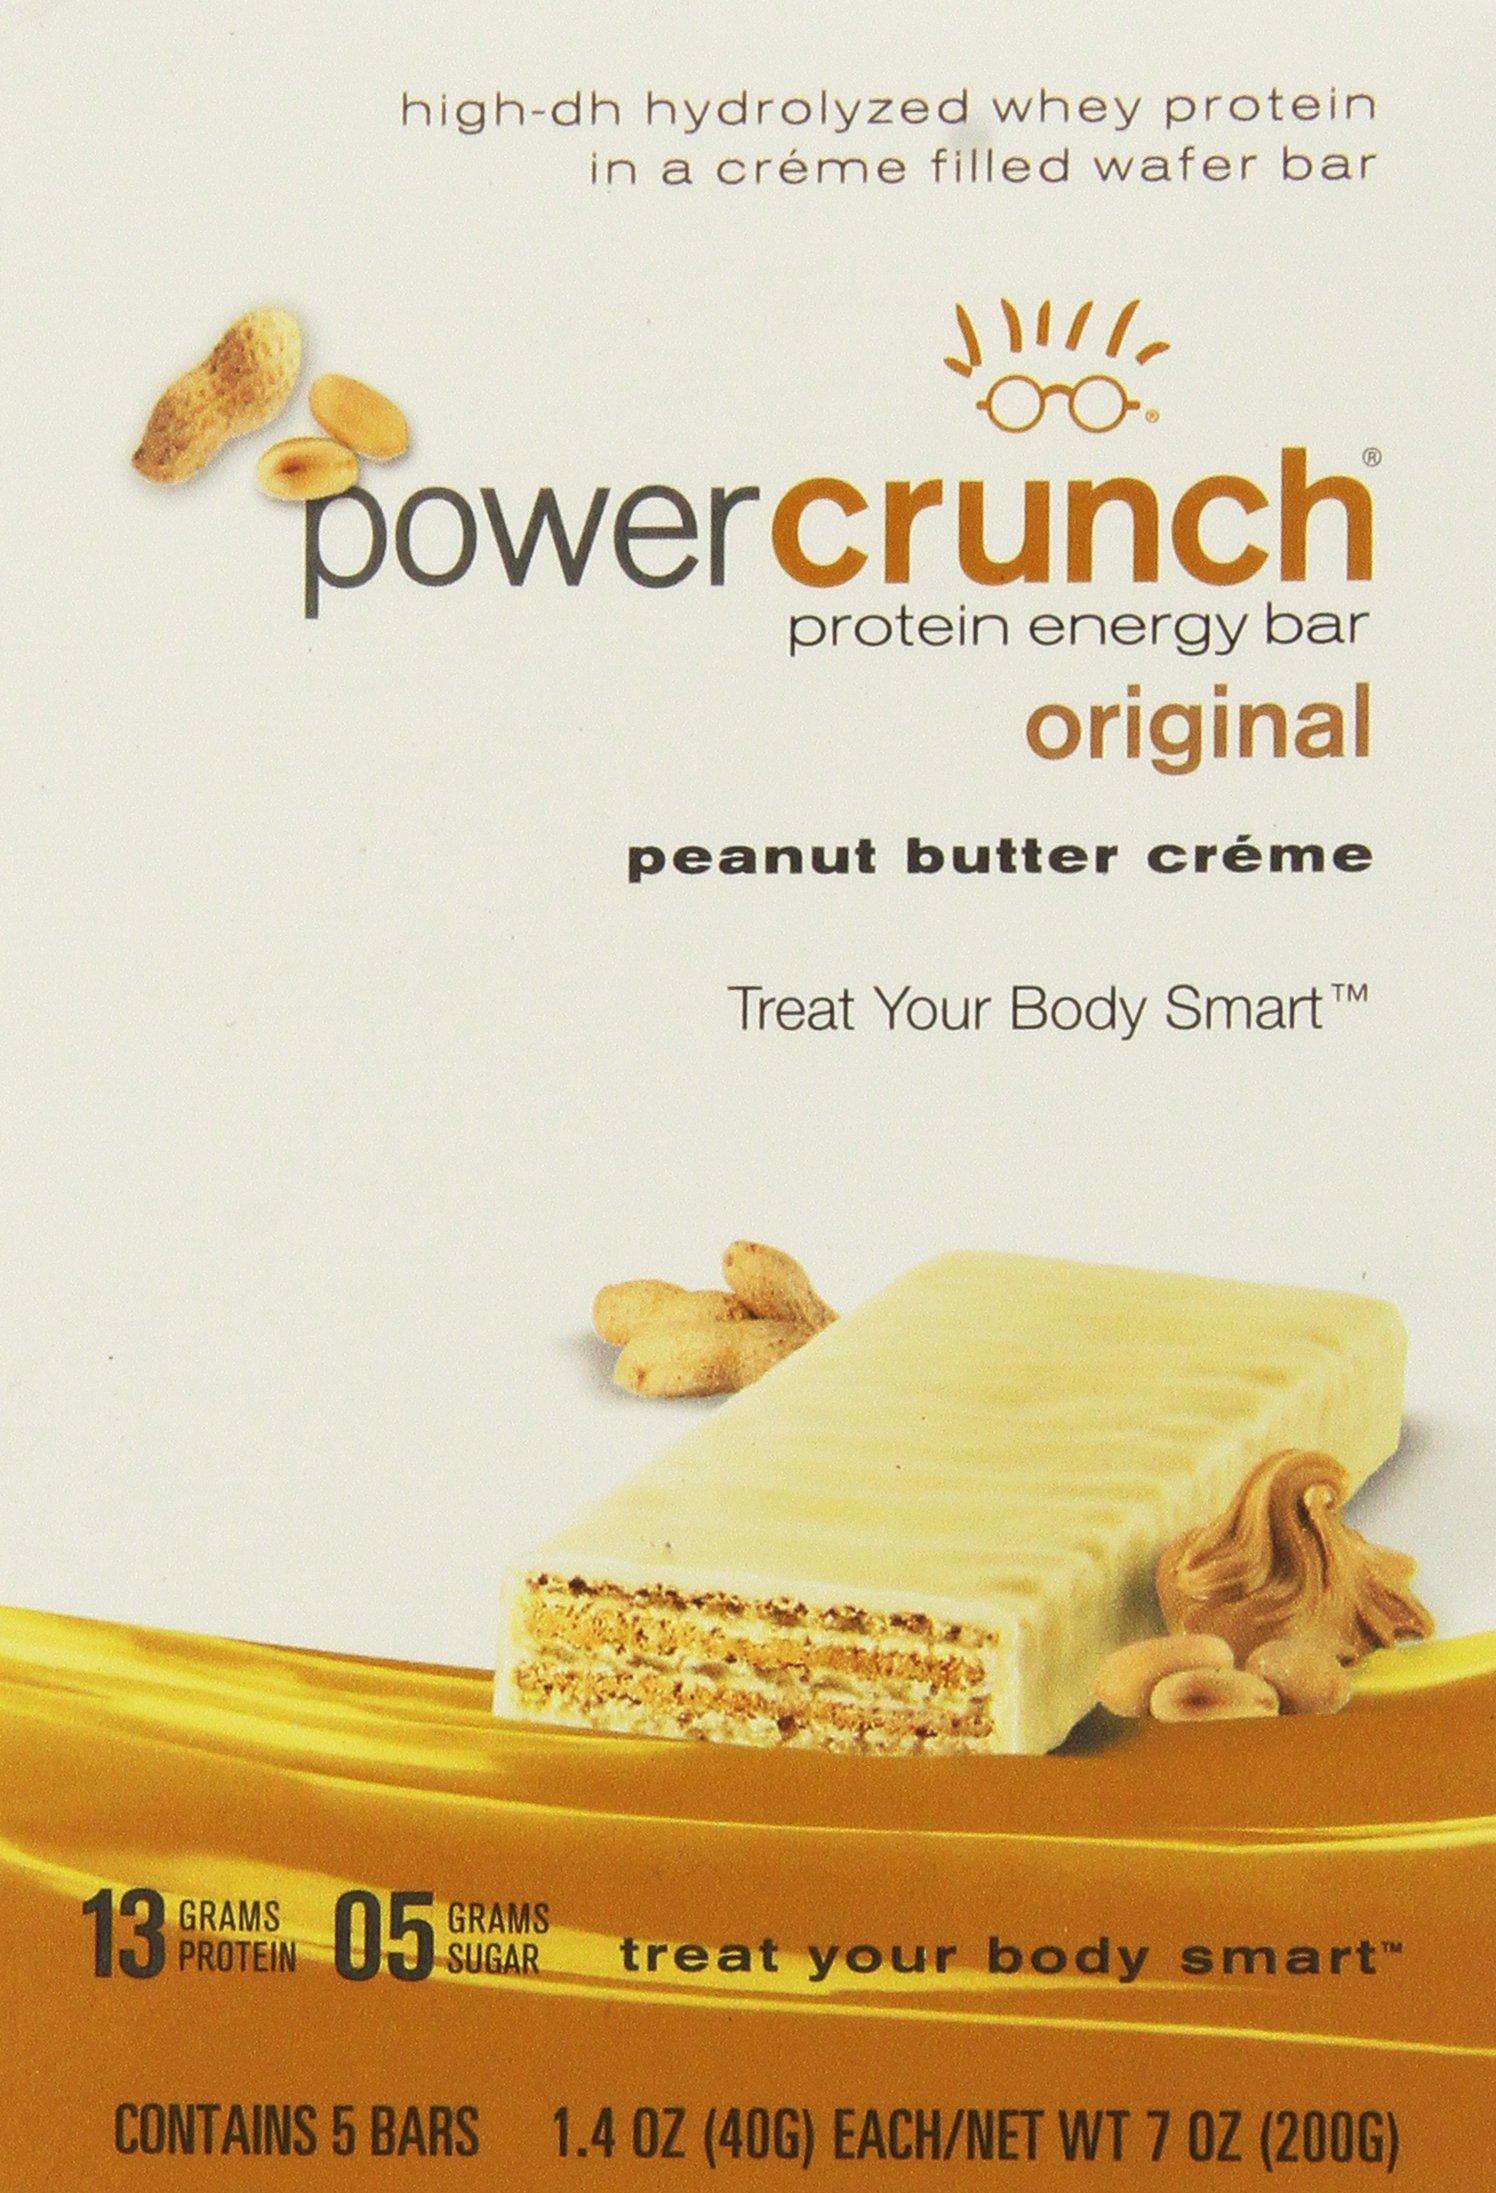 Amazon.com: Power Crunch Protein Energy, Peanut Butter Fudge Butter Fudge, 1.4 Ounce, 12 pack